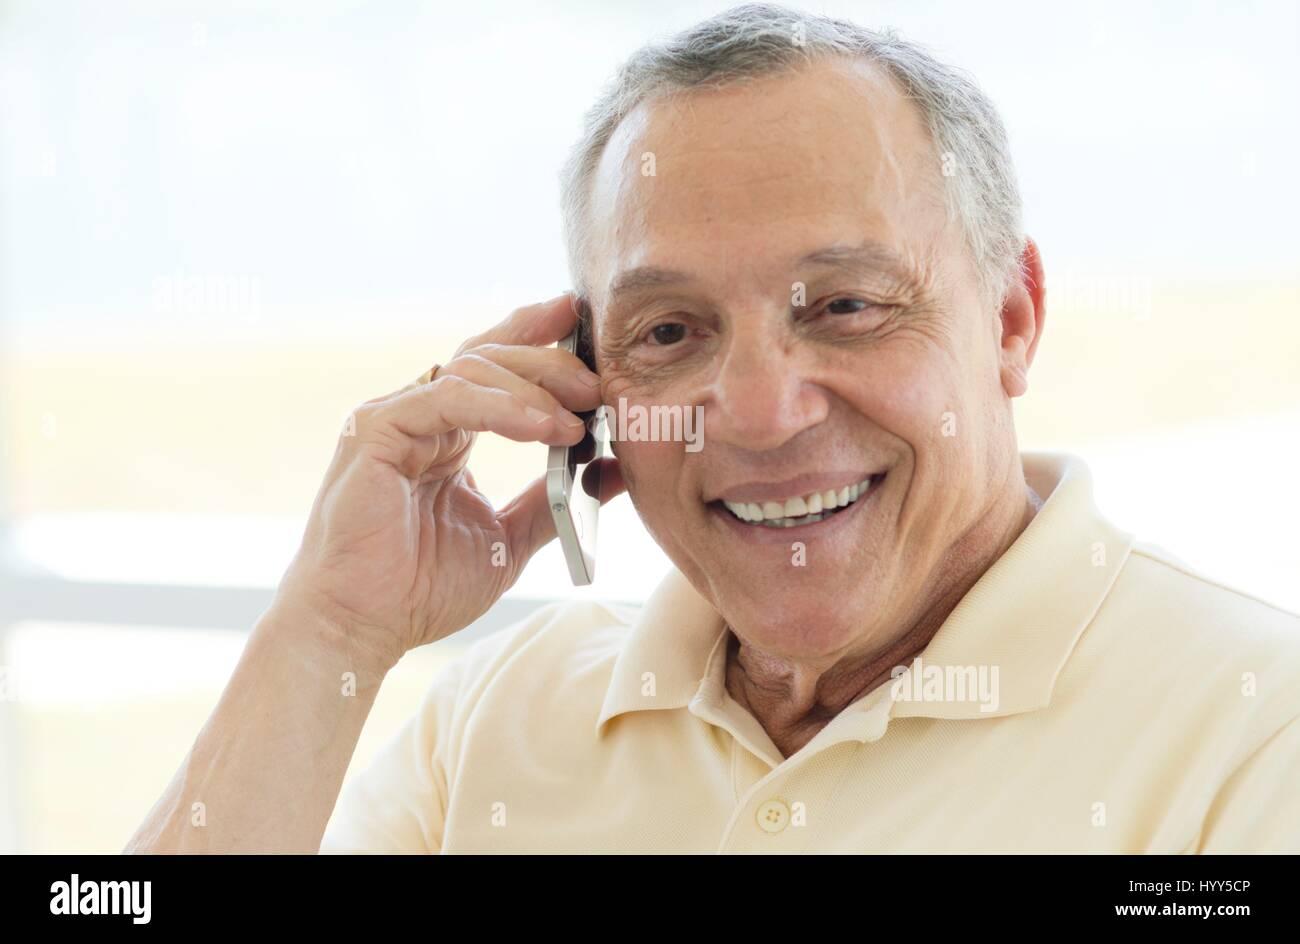 Senior man on cell phone. - Stock Image